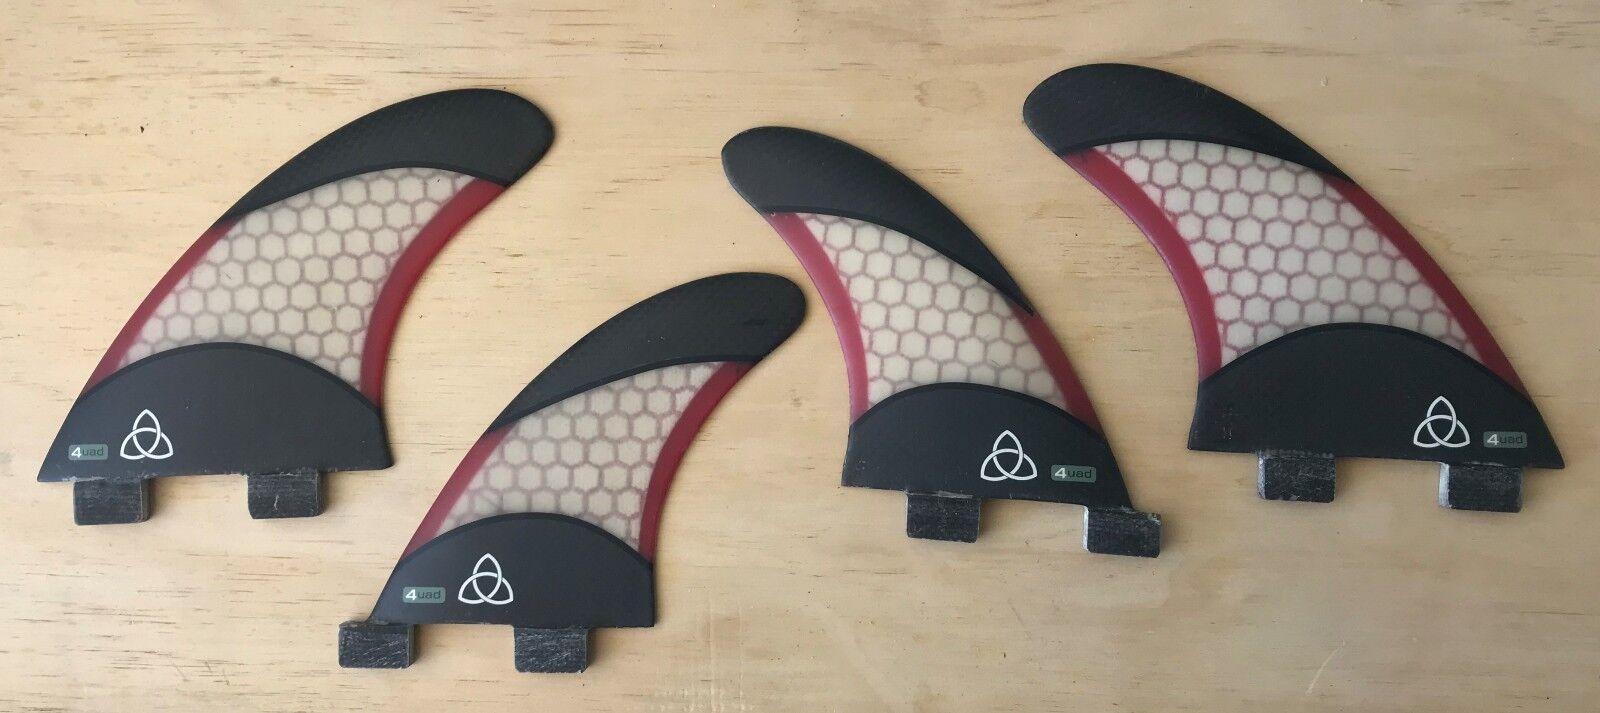 Medium Fiberglass Surfboard Fins - Quad (Set of 4) Red White Carbon Fiber, FCS